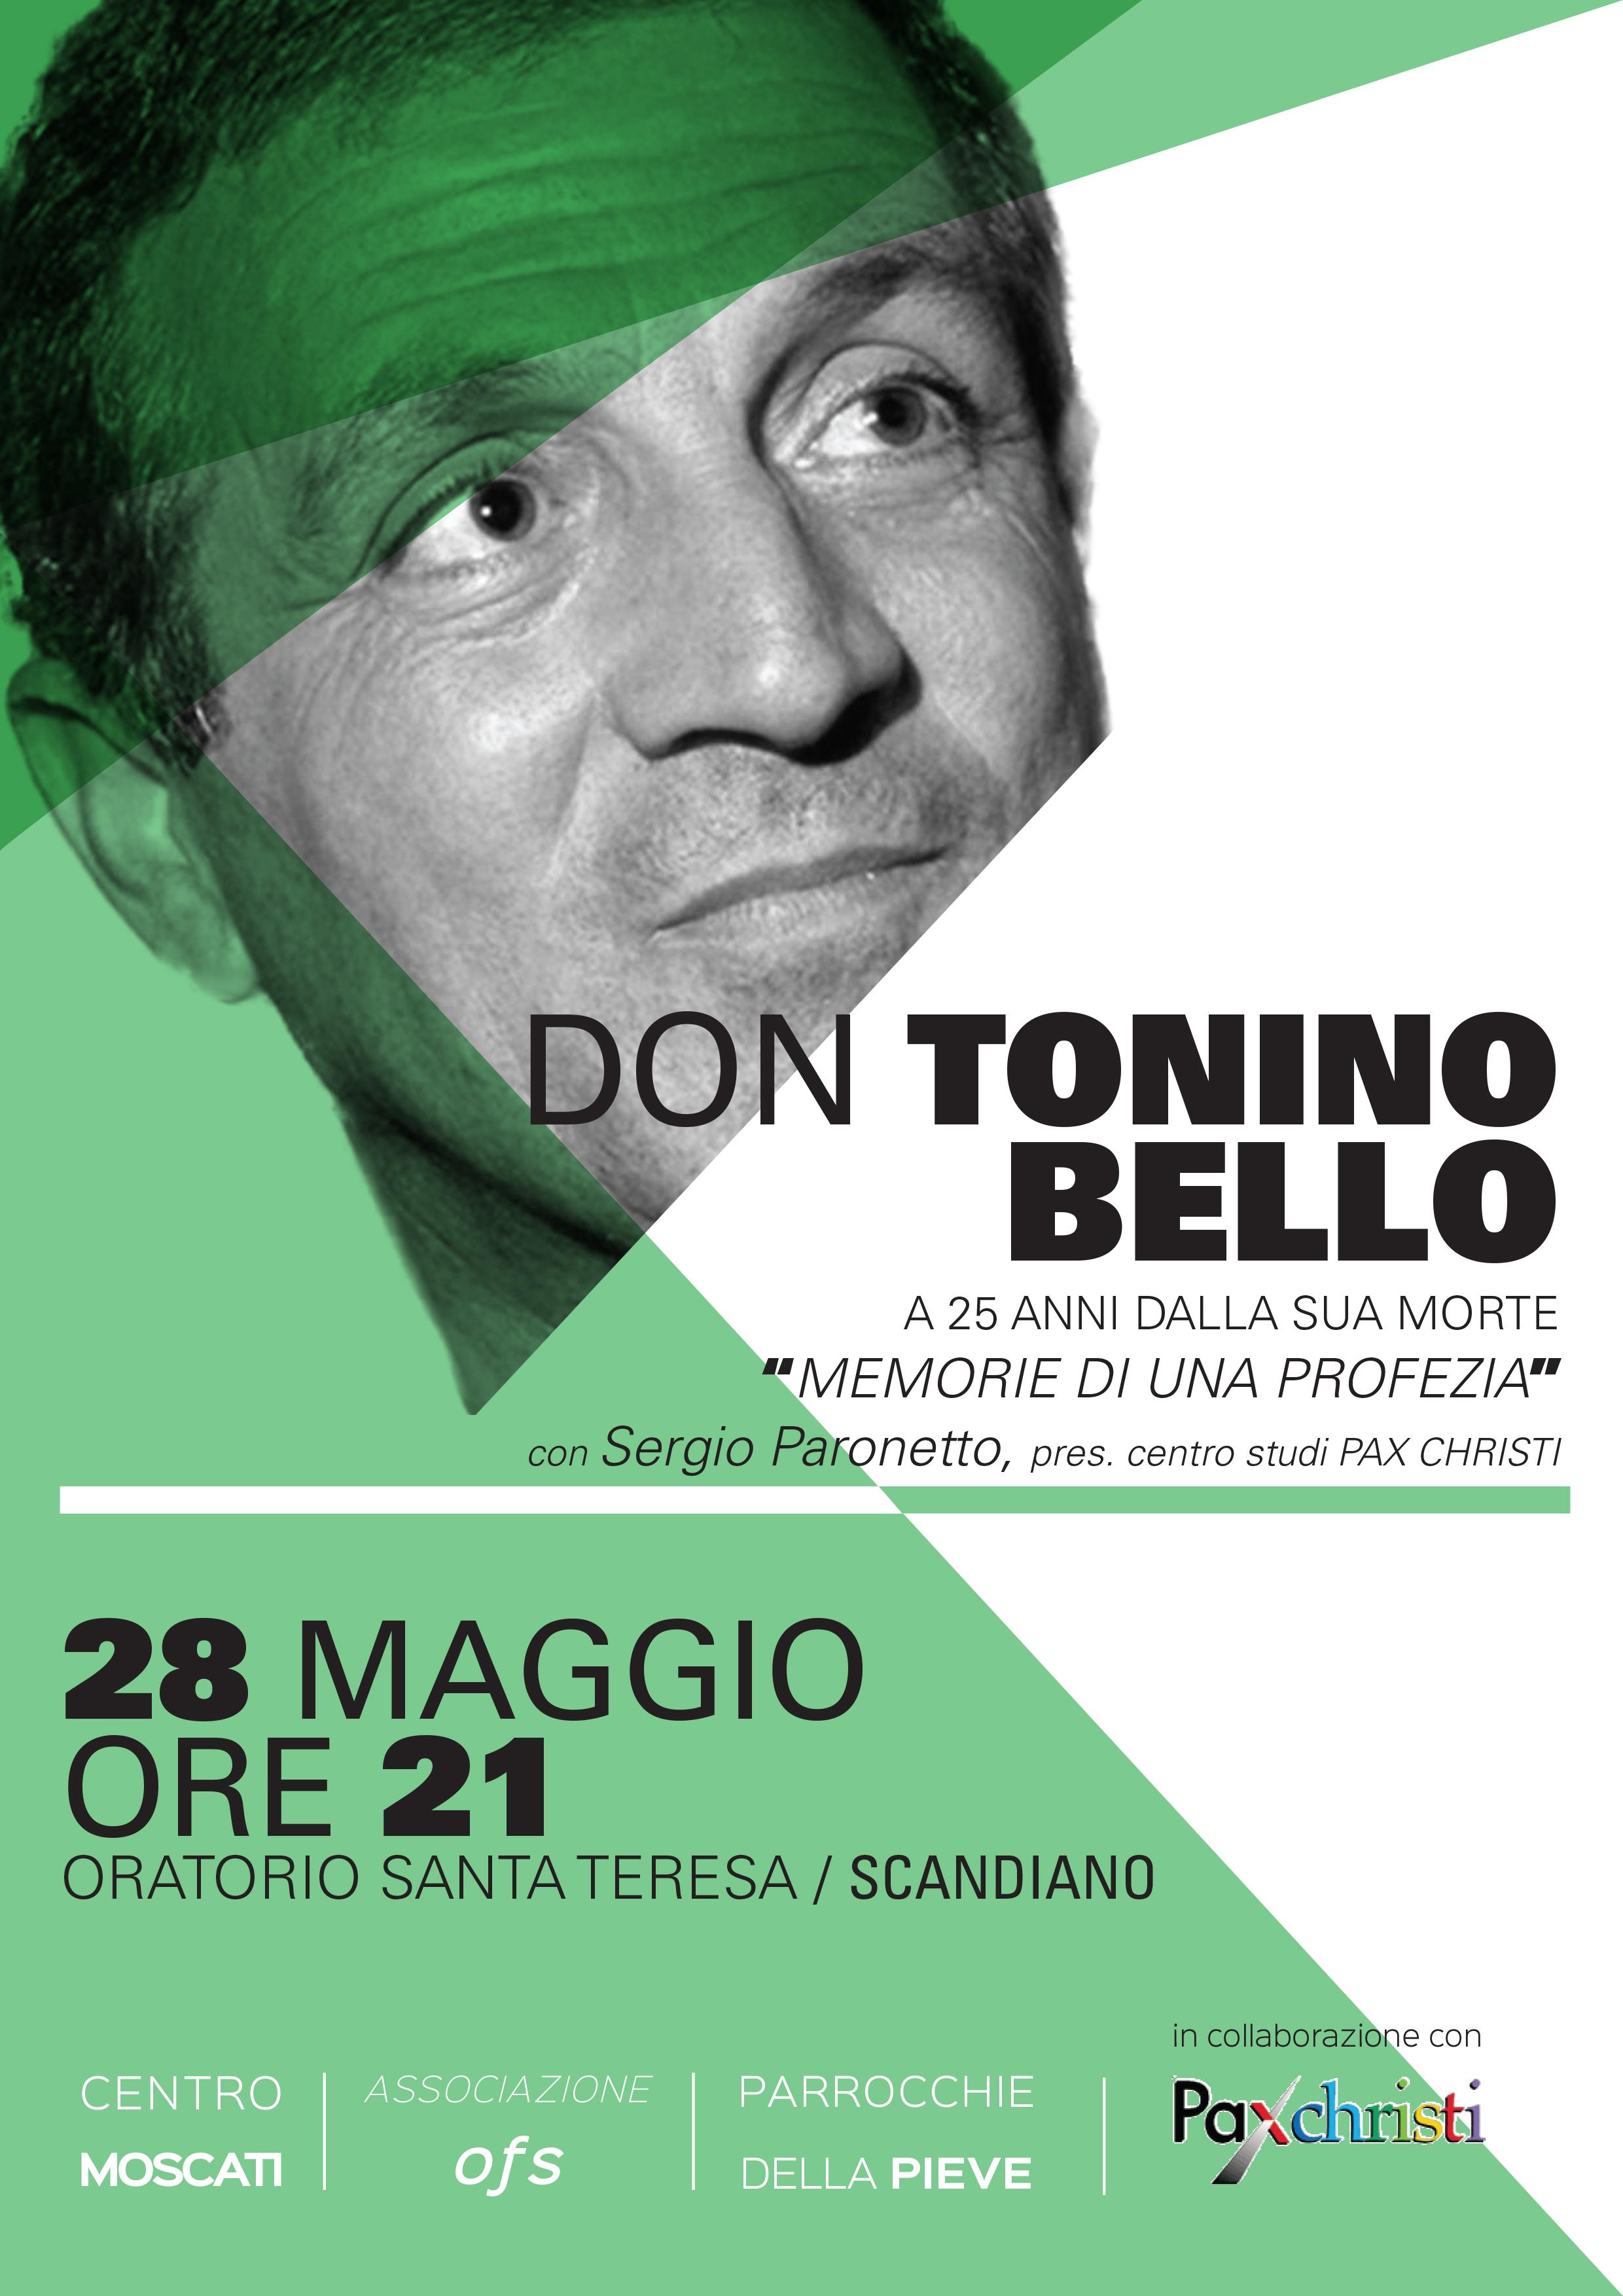 flyer don tonino bello